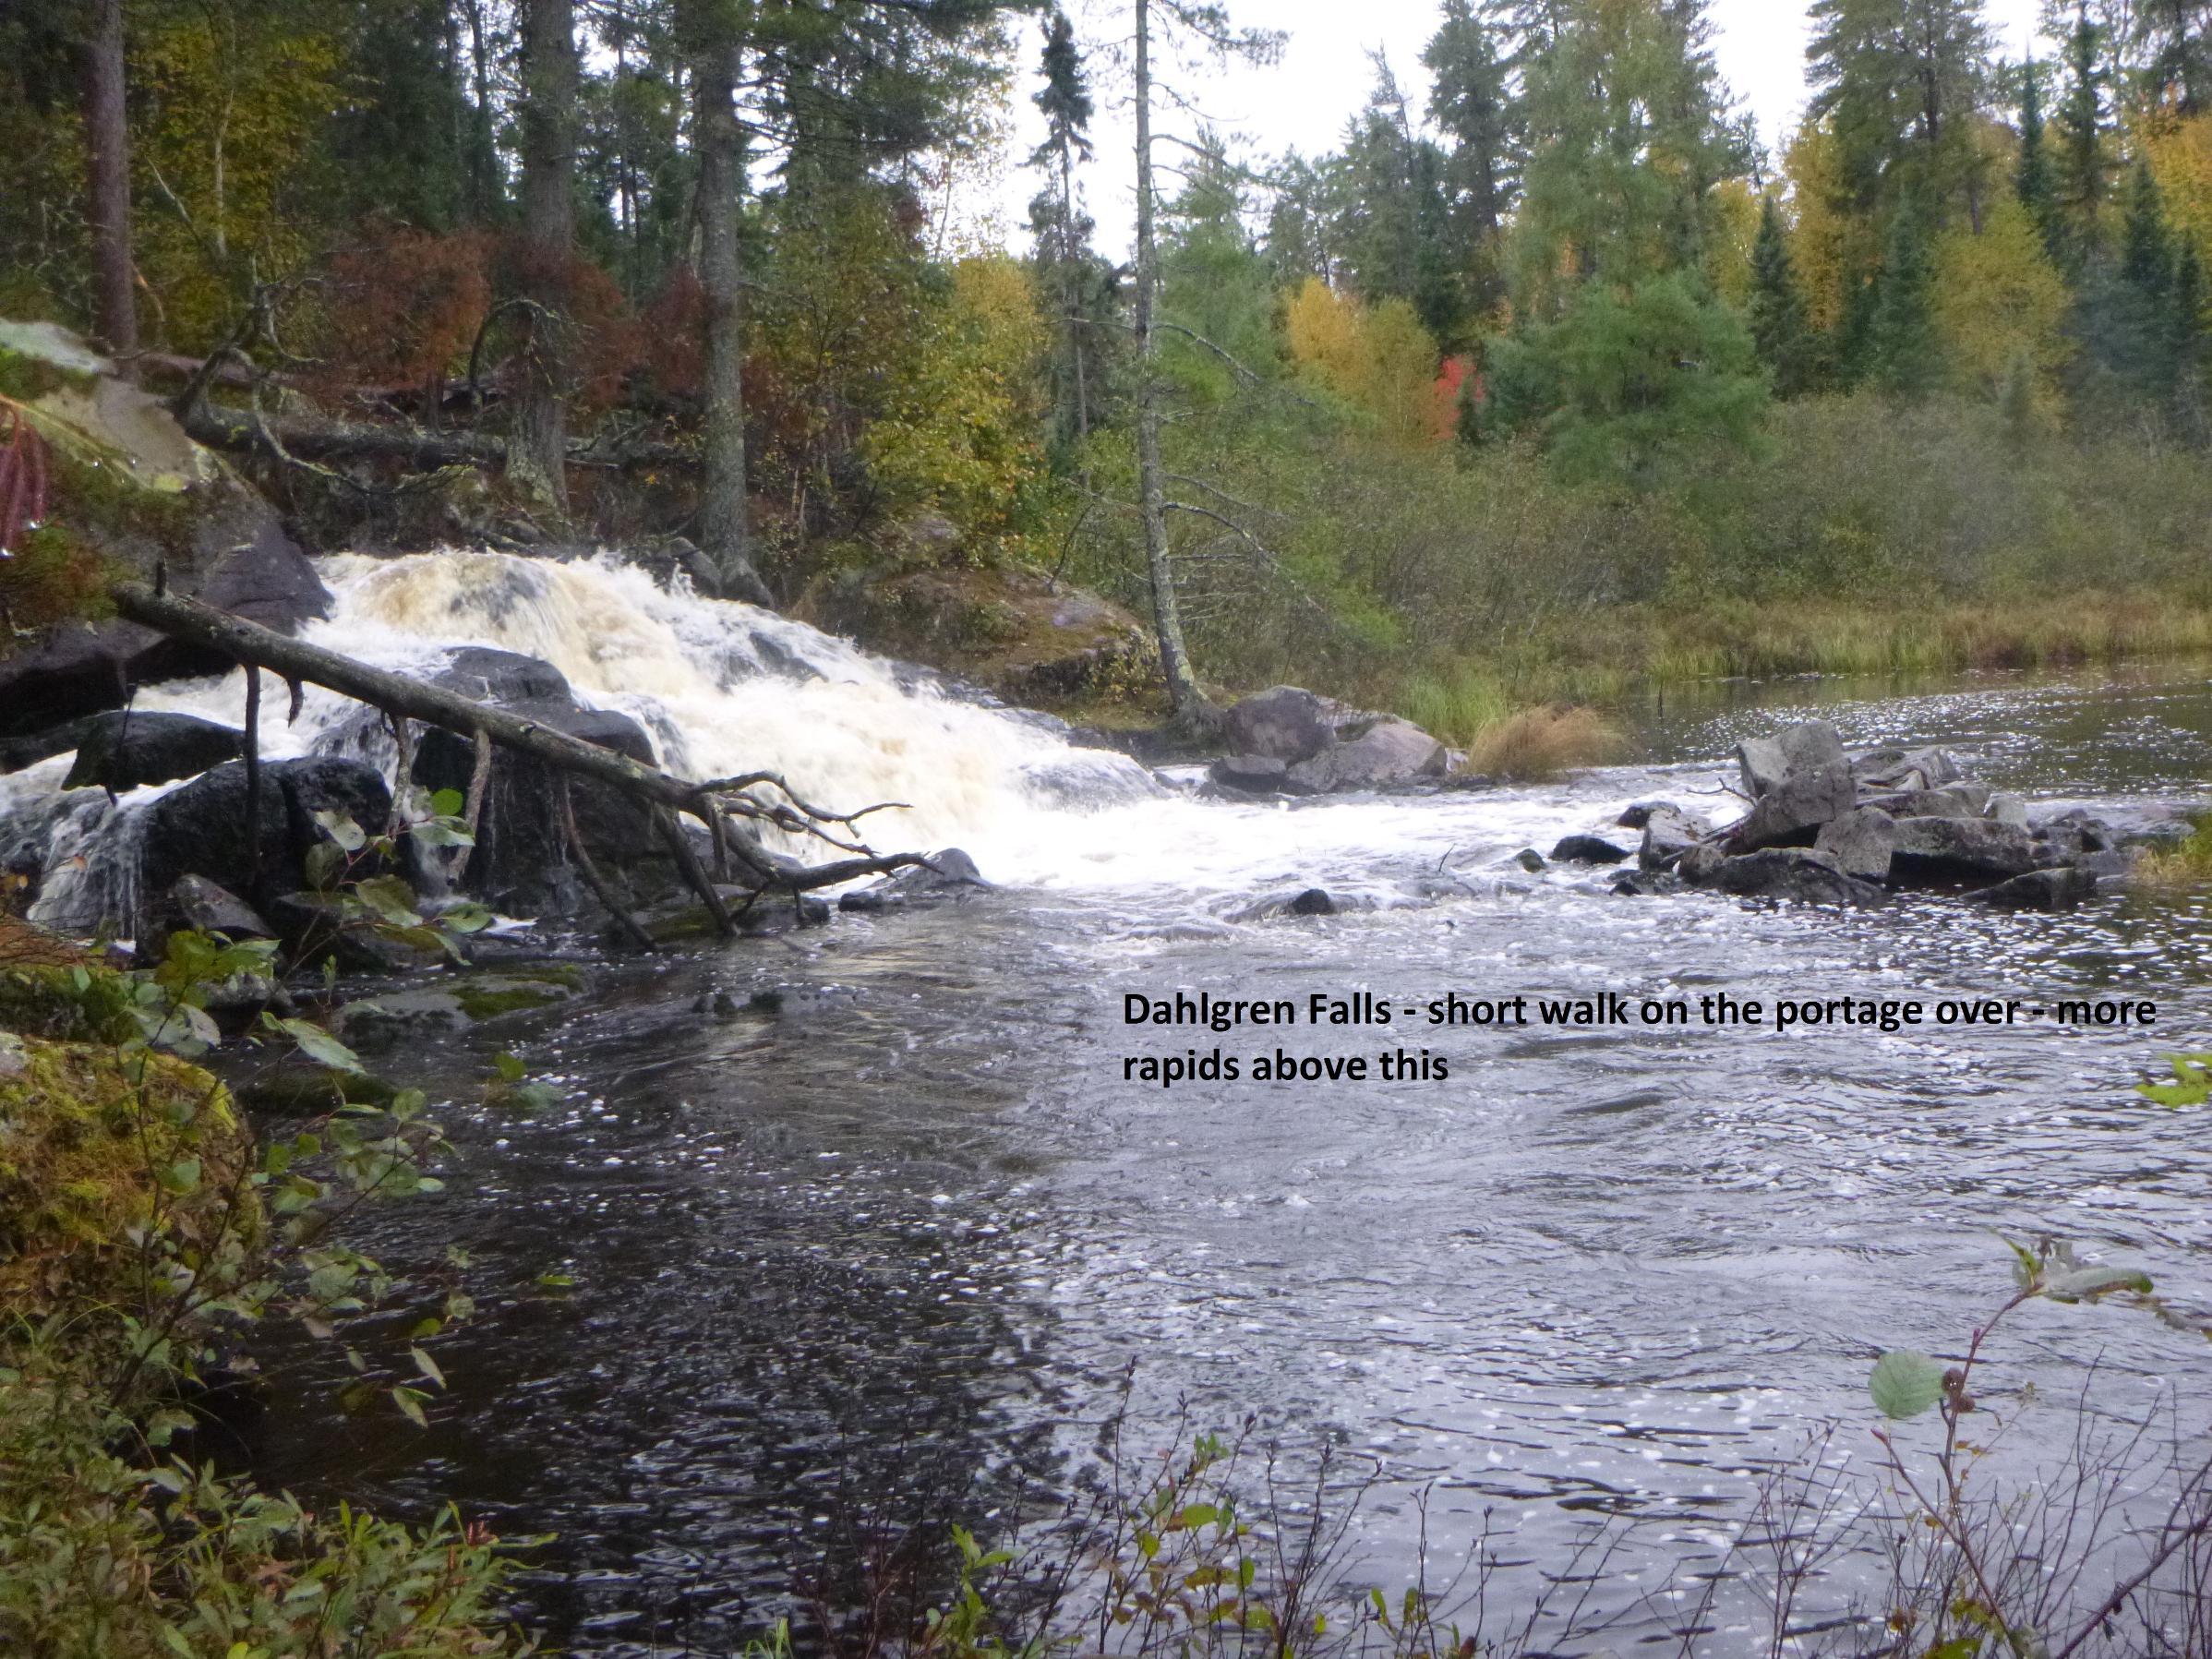 Dahlgren Falls